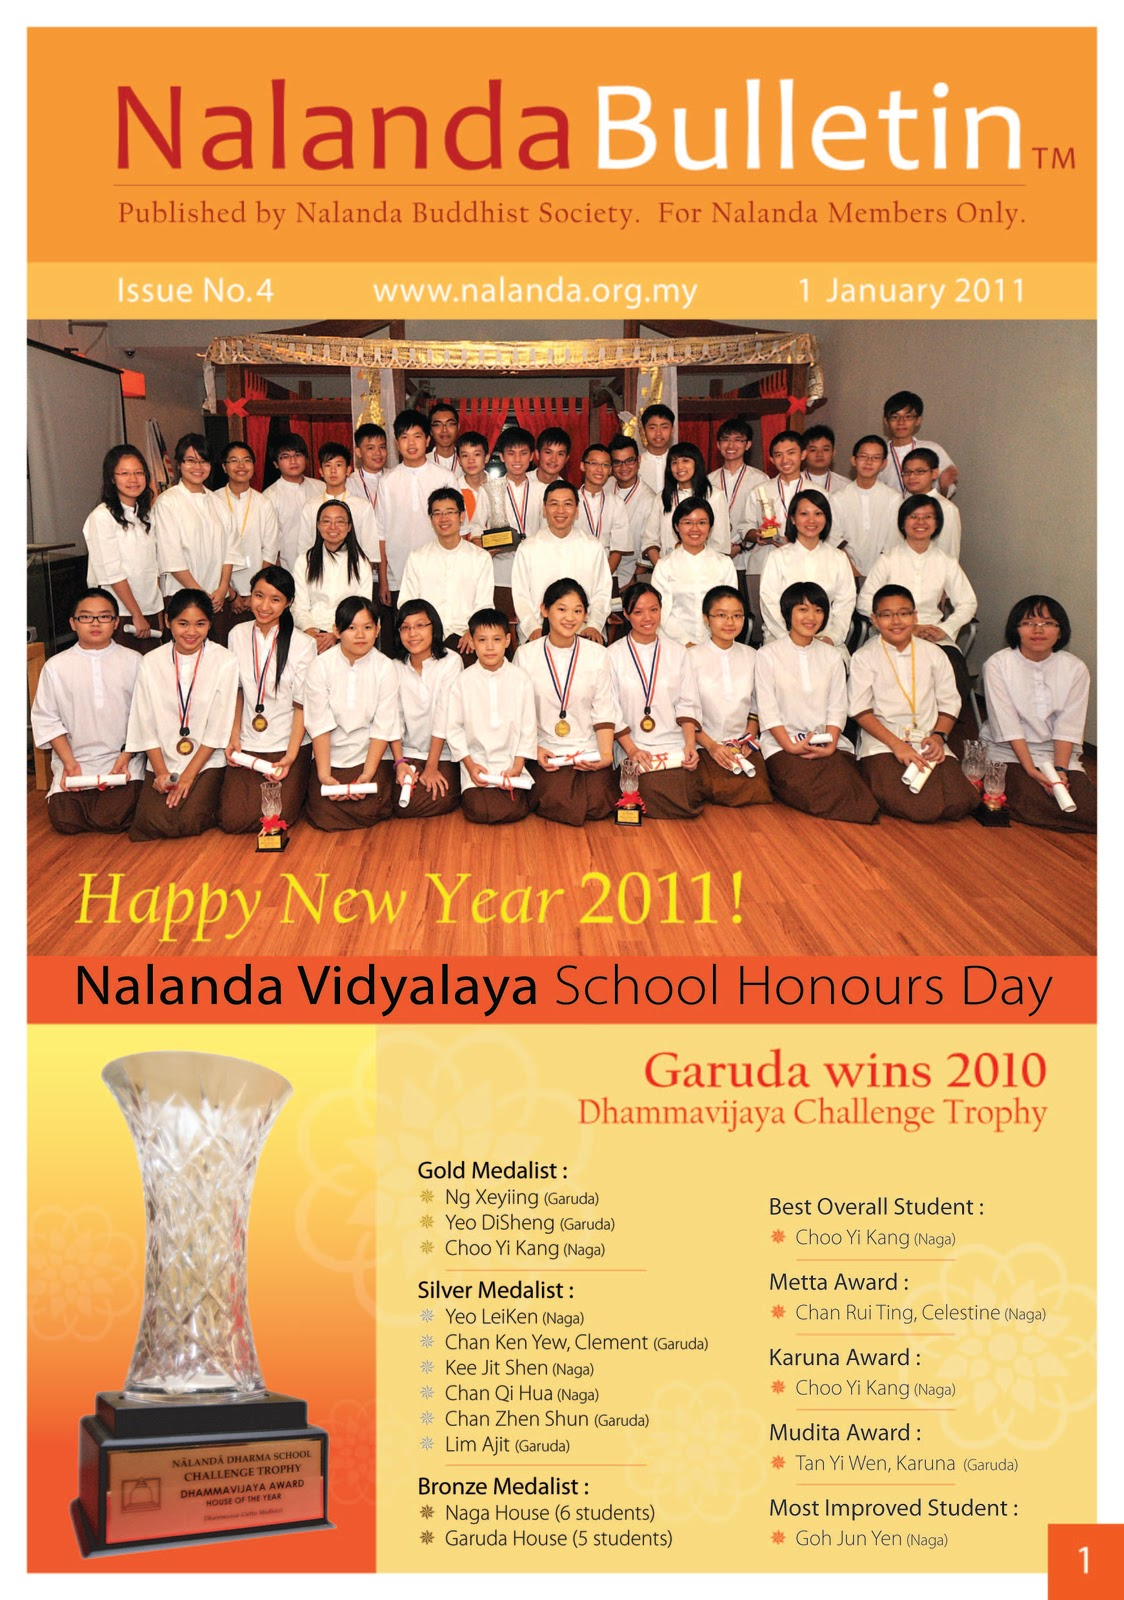 Nalanda - Nalanda No Samba